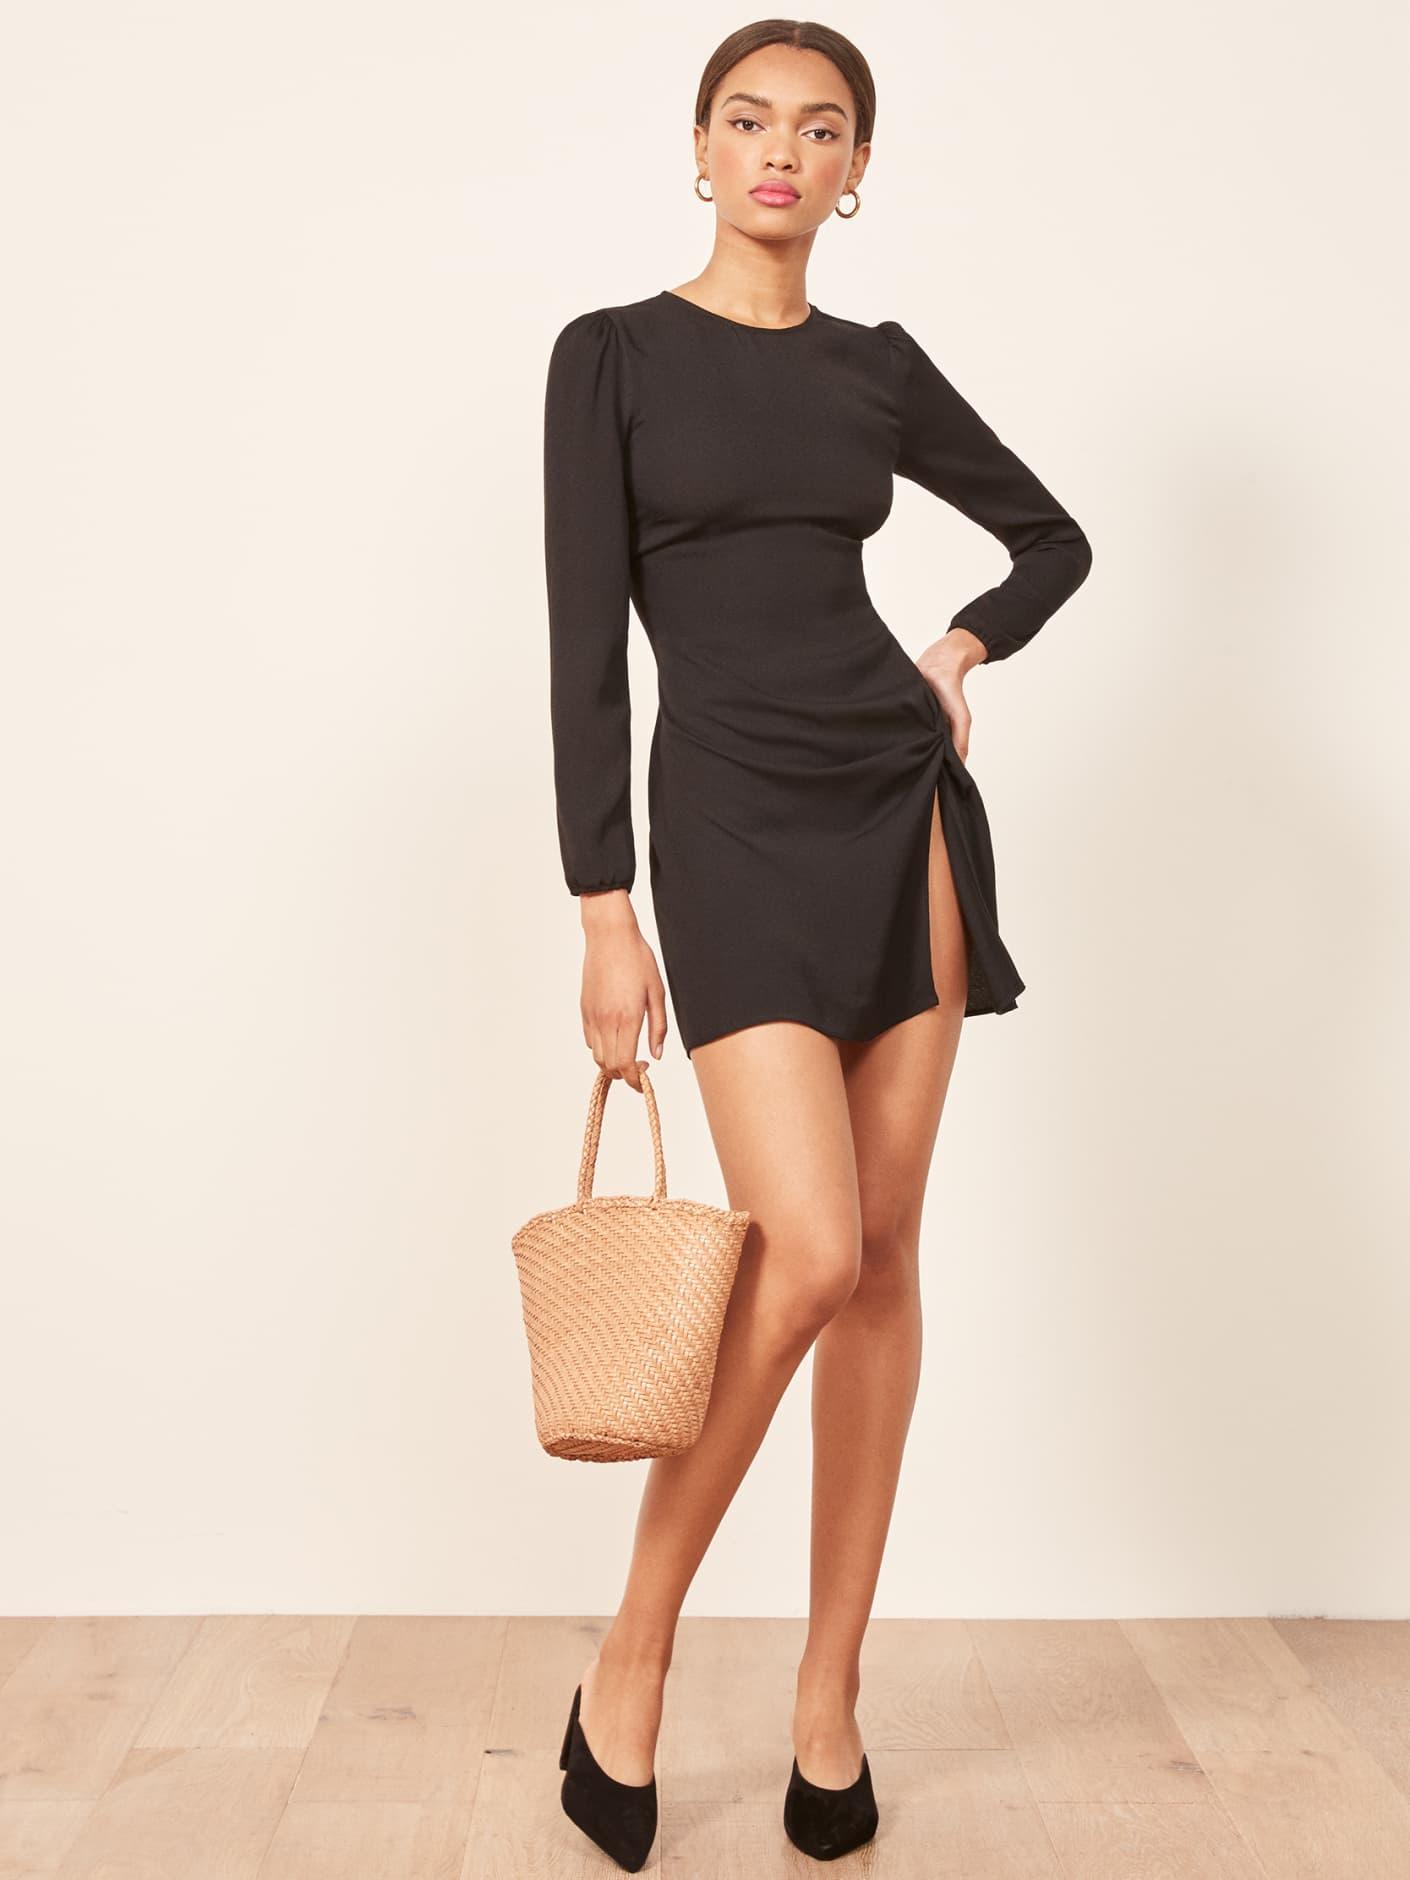 6d79df968bfde REFORMATION Cara Black Dress - We Select Dresses